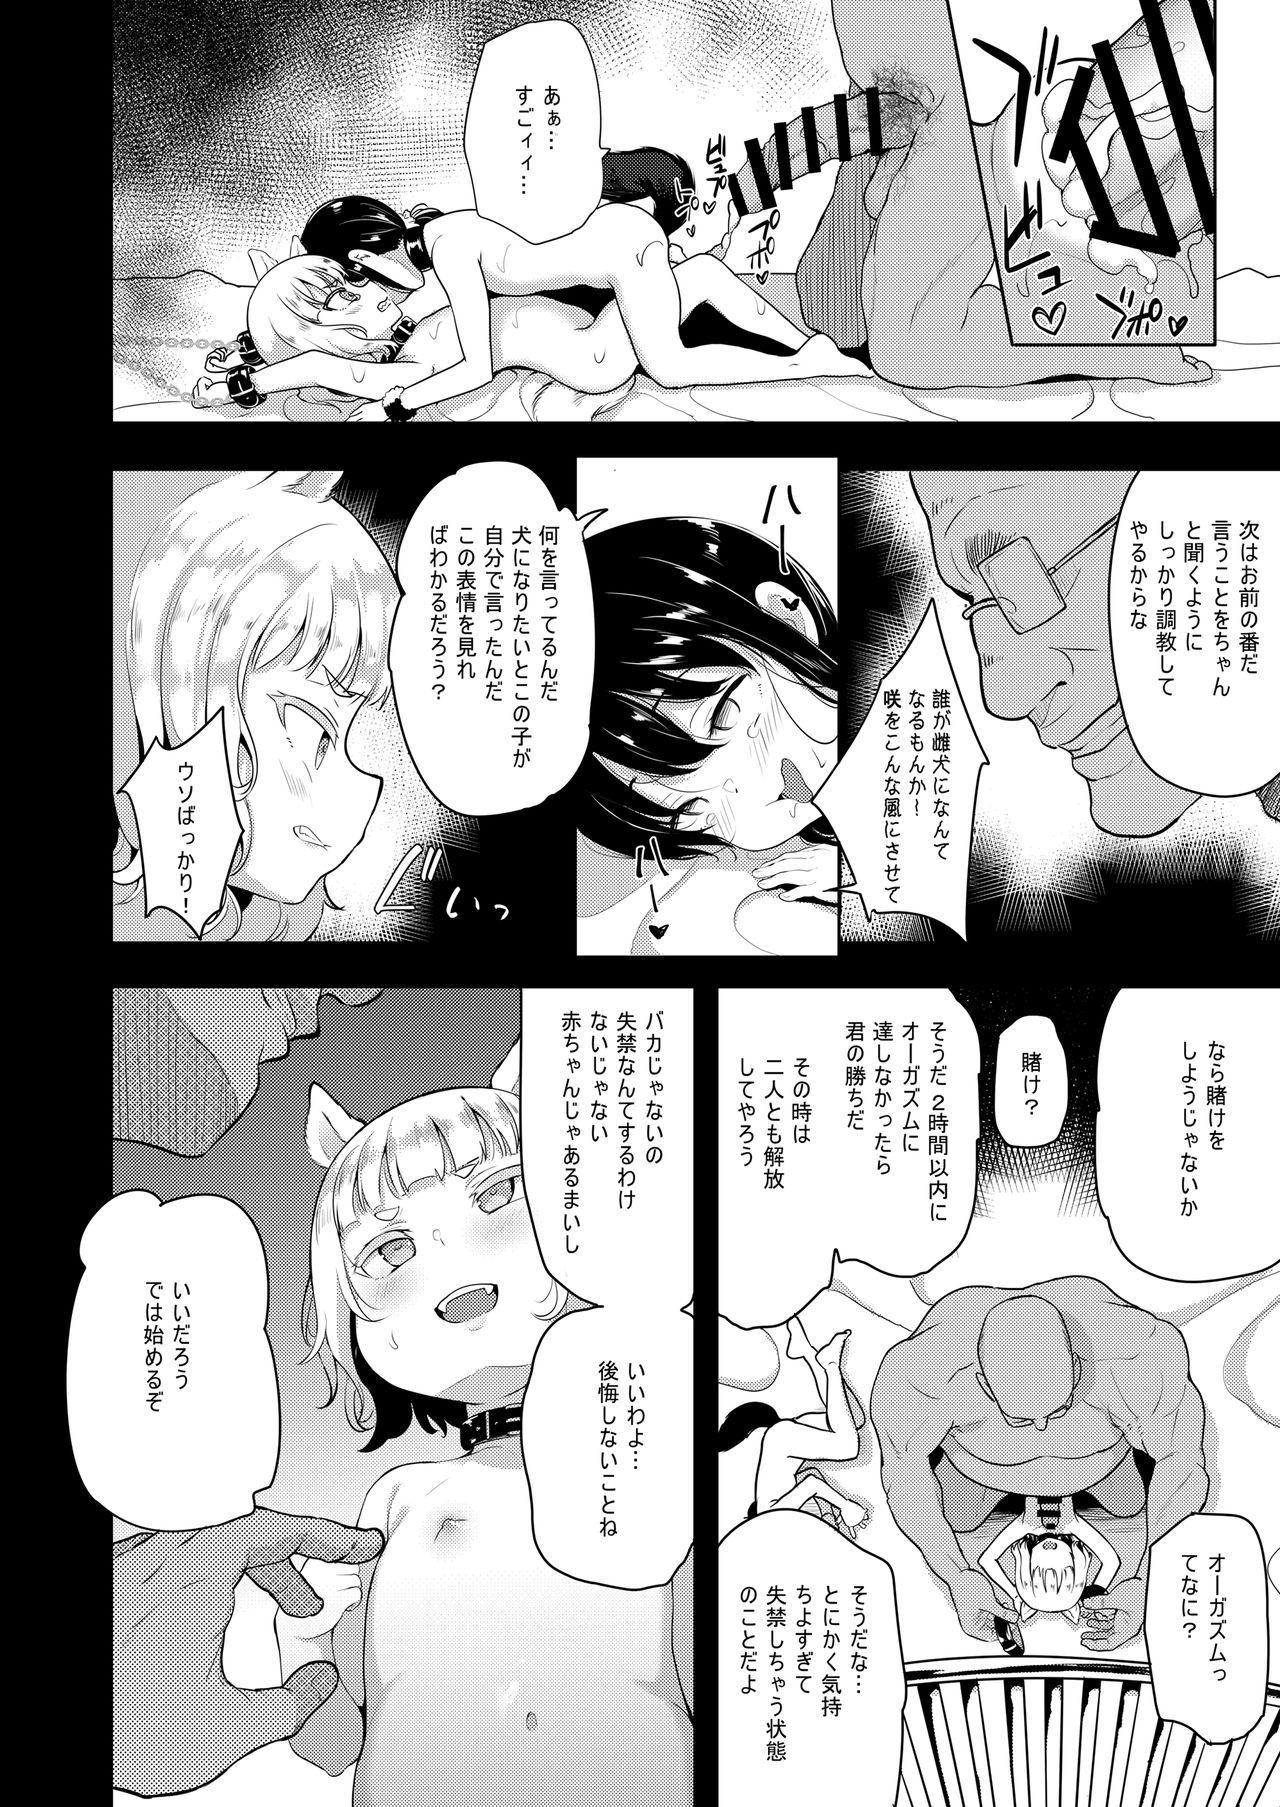 Seiyouken Choukyou 2 13